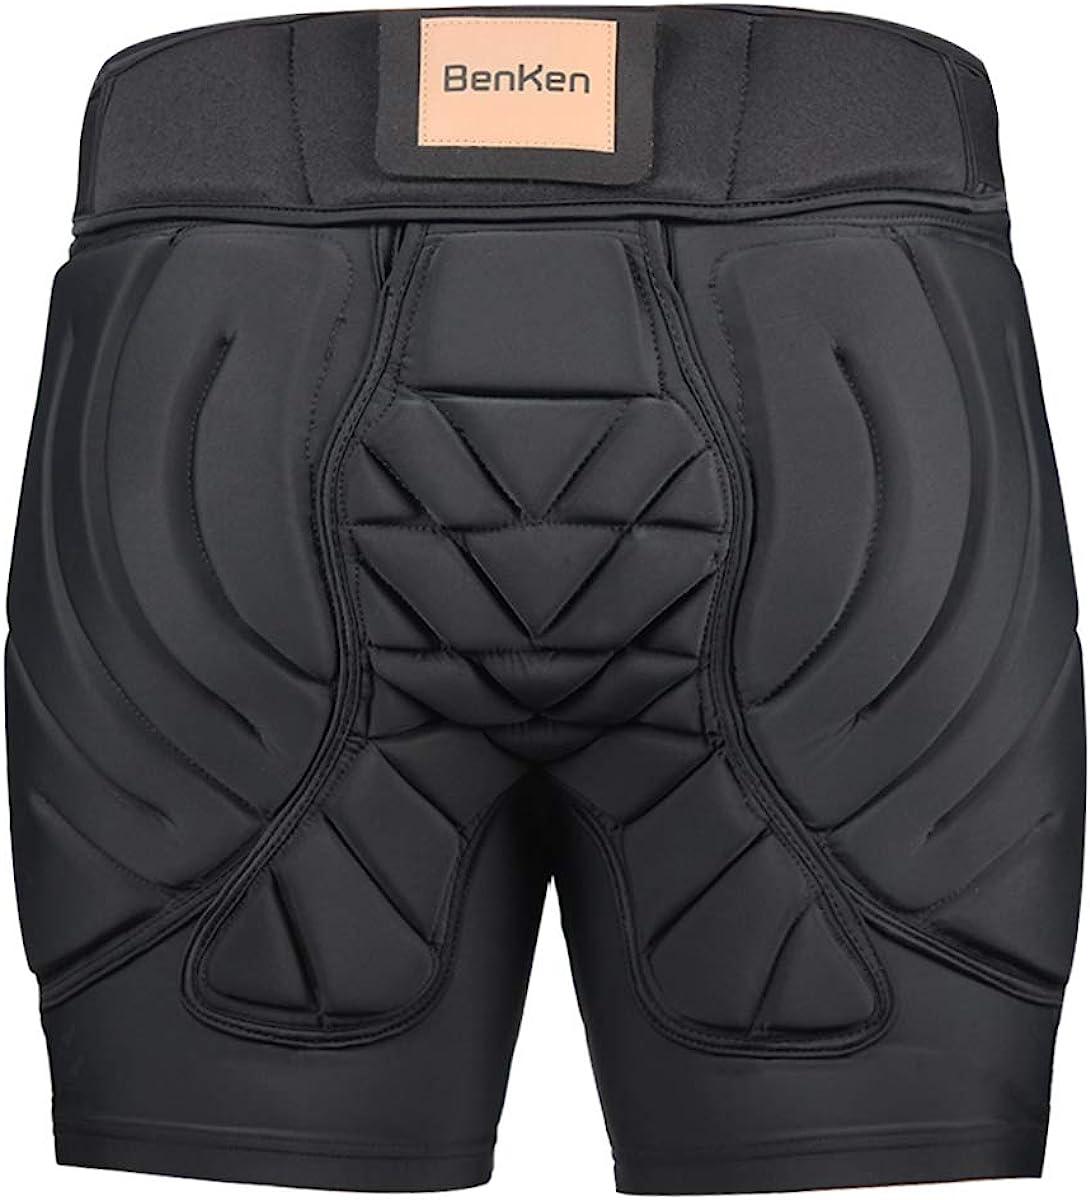 BenKen Hip Protective Padded Short Pants: Clothing